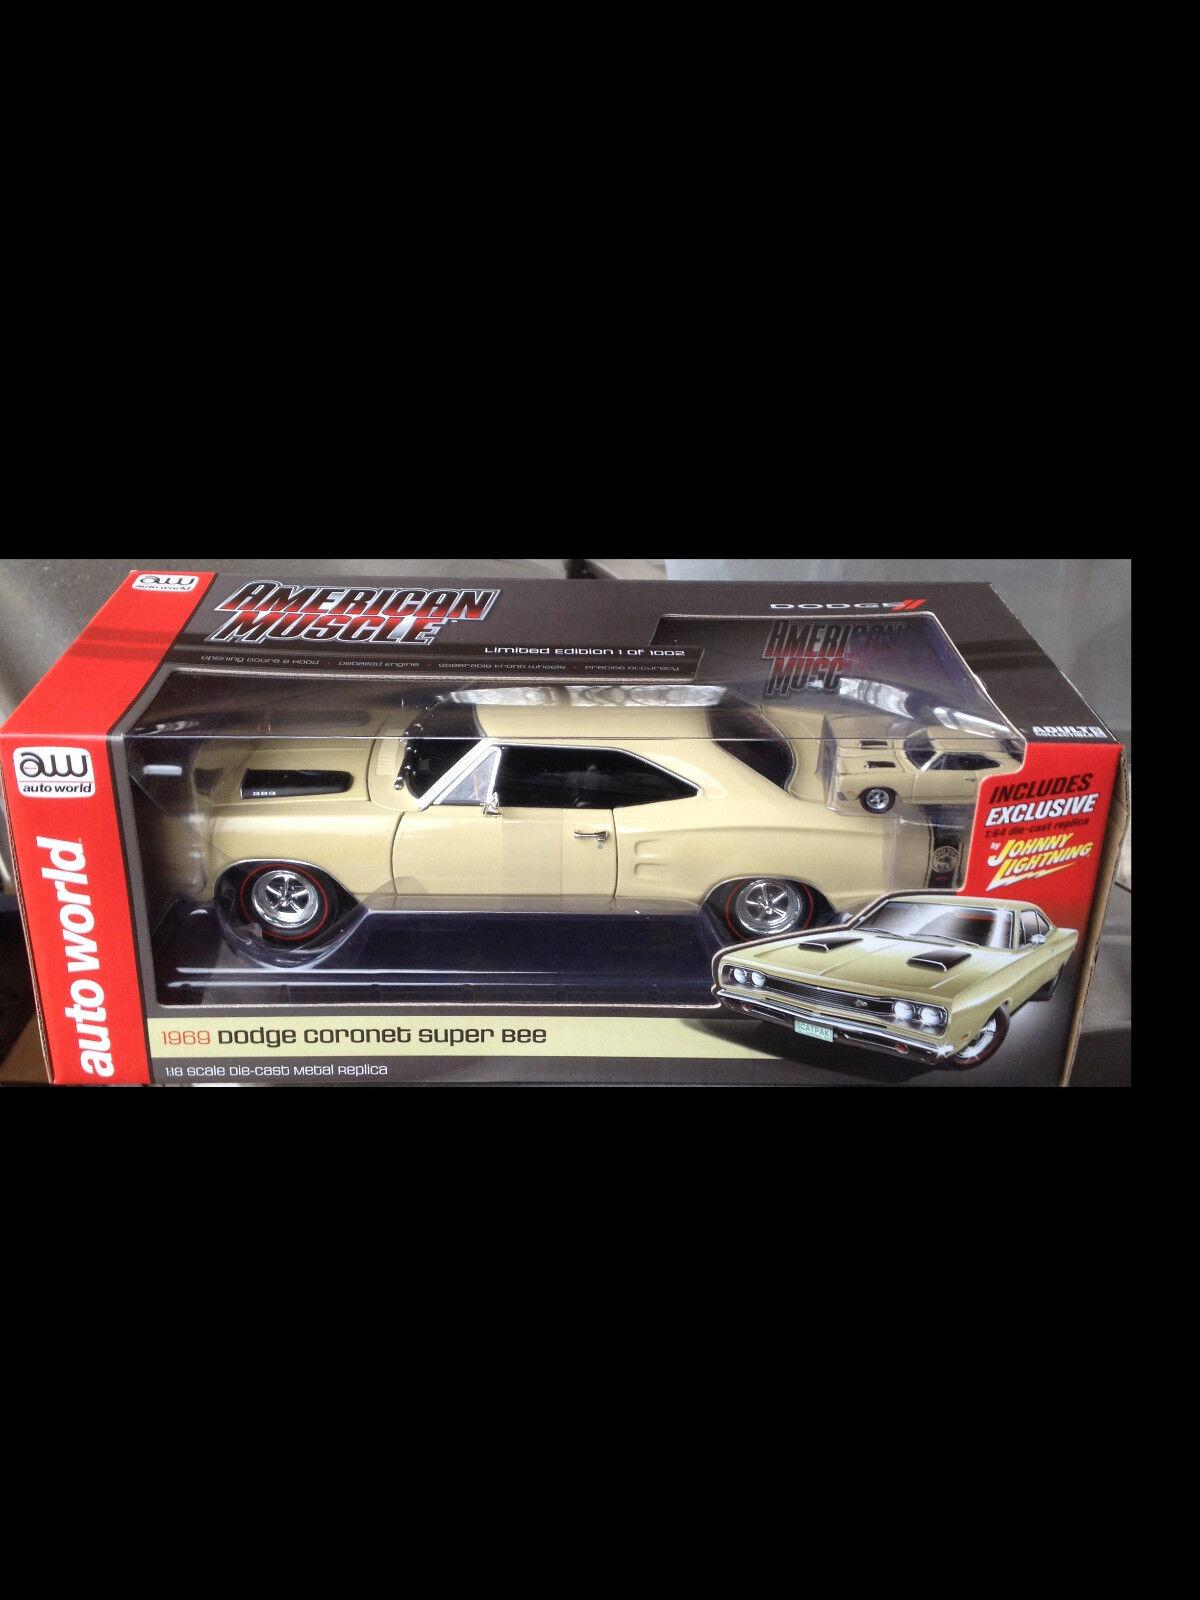 Venta barata 1969 Dodge súperbee Crema 1 18 Auto Auto Auto World 1094  marcas de moda